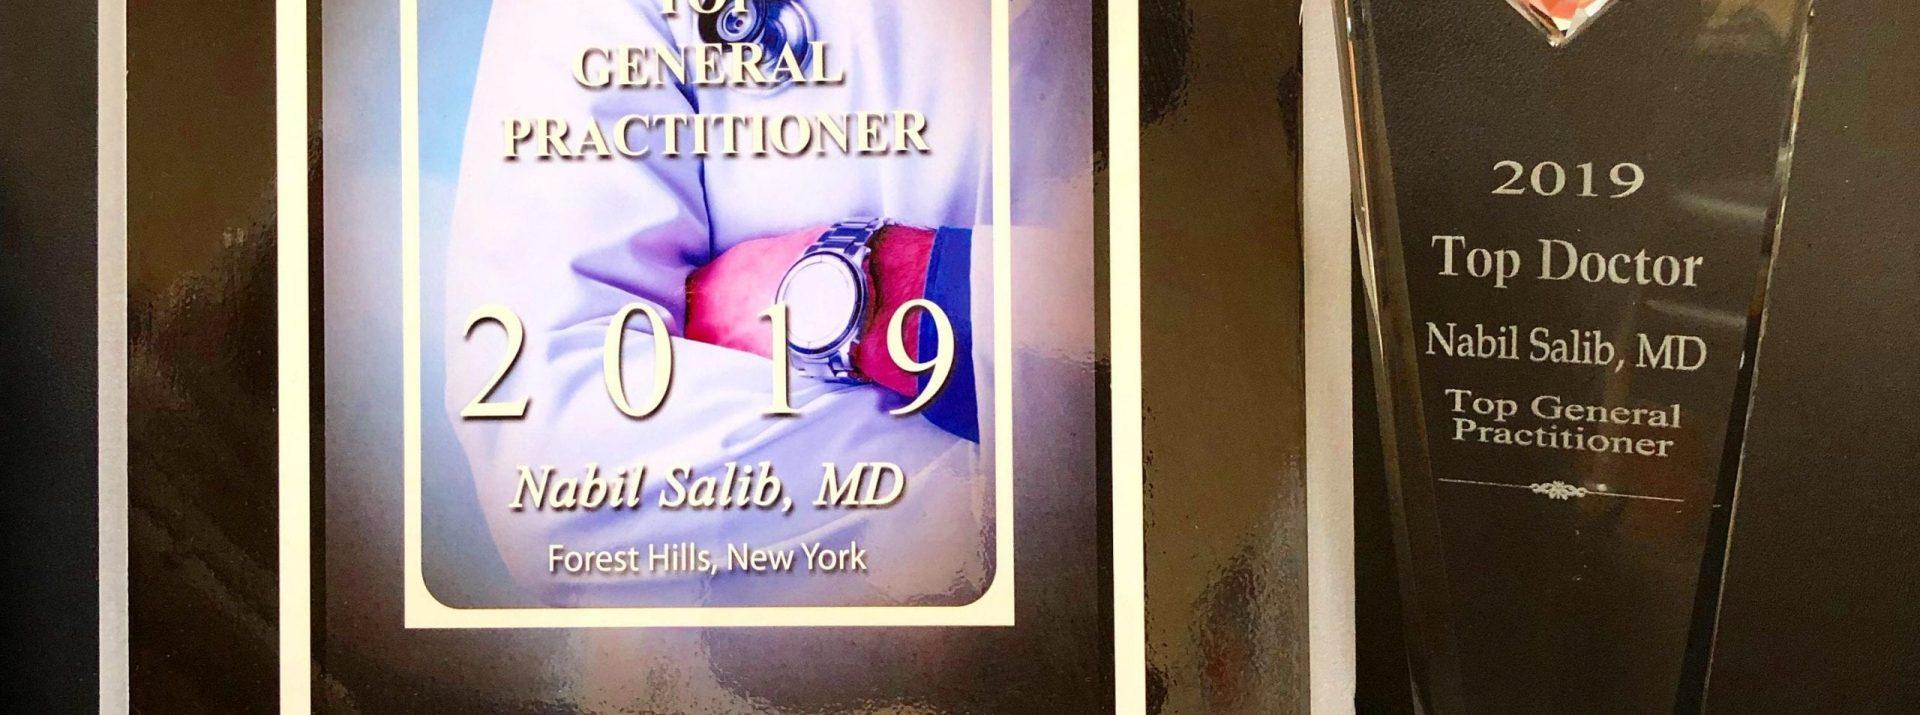 2019 PREMIO AL MEJOR DOCTOR